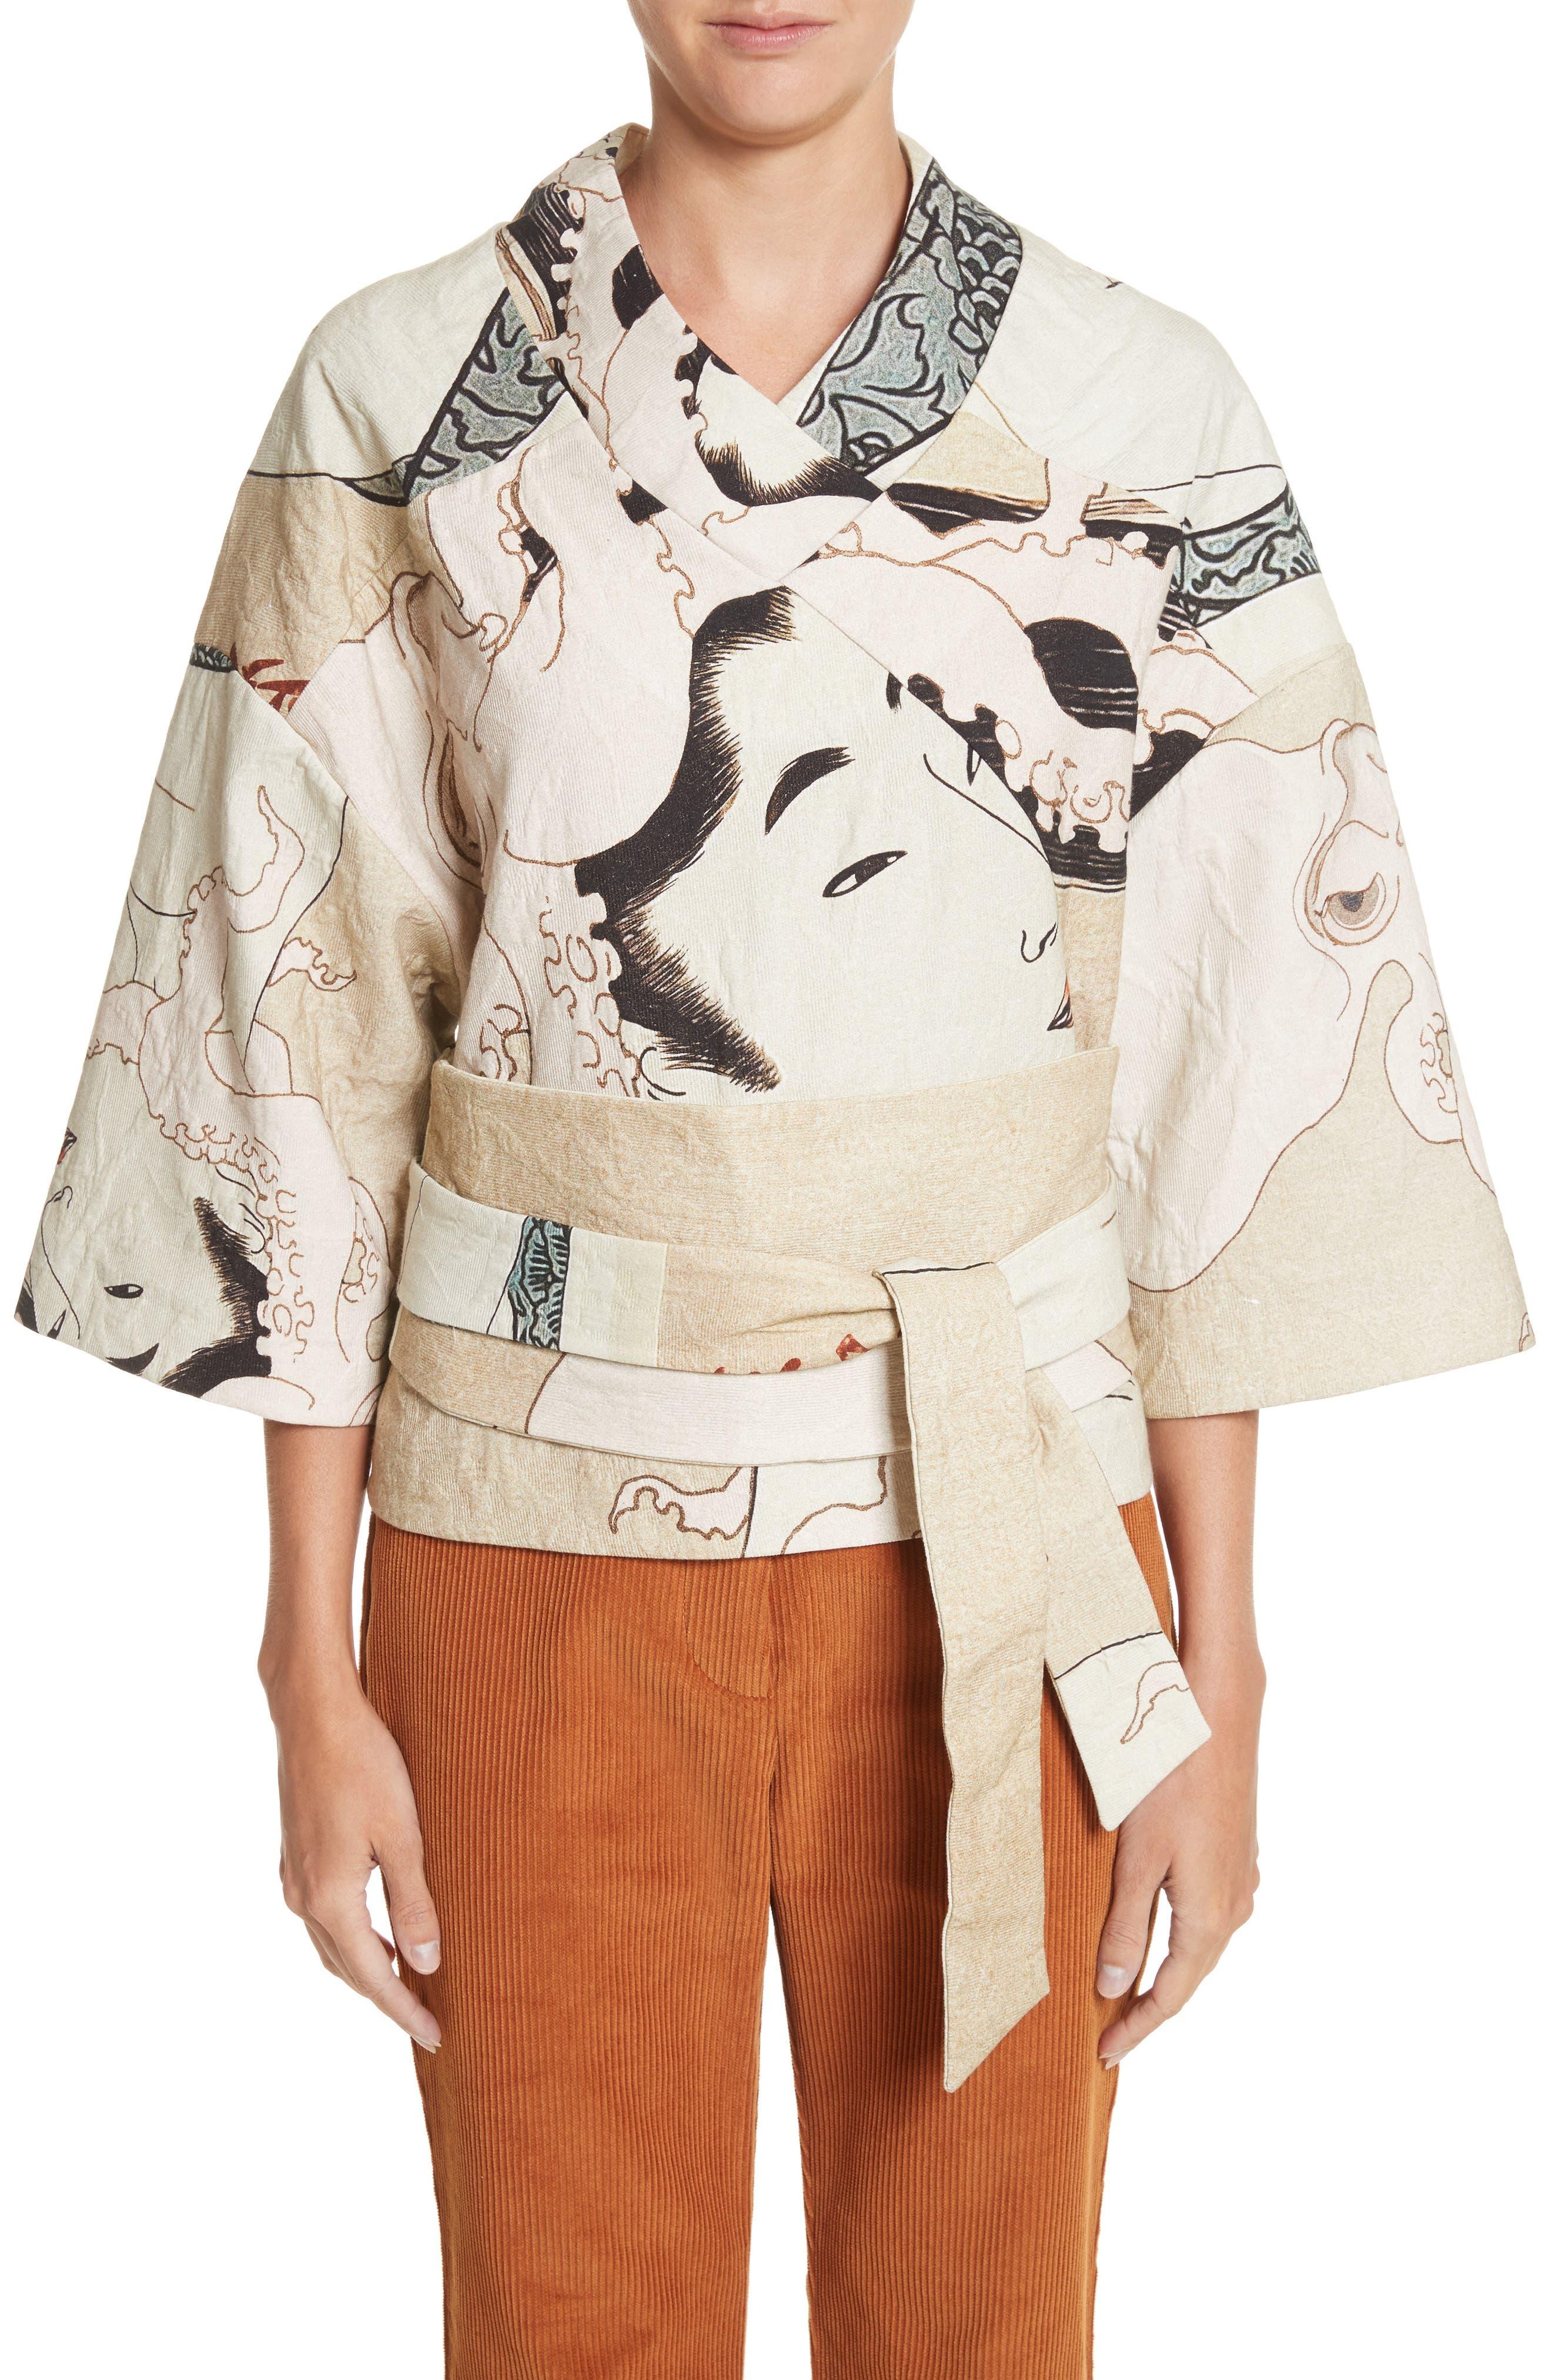 Main Image - A.W.A.K.E. Printed Kimono Bomber Jacket